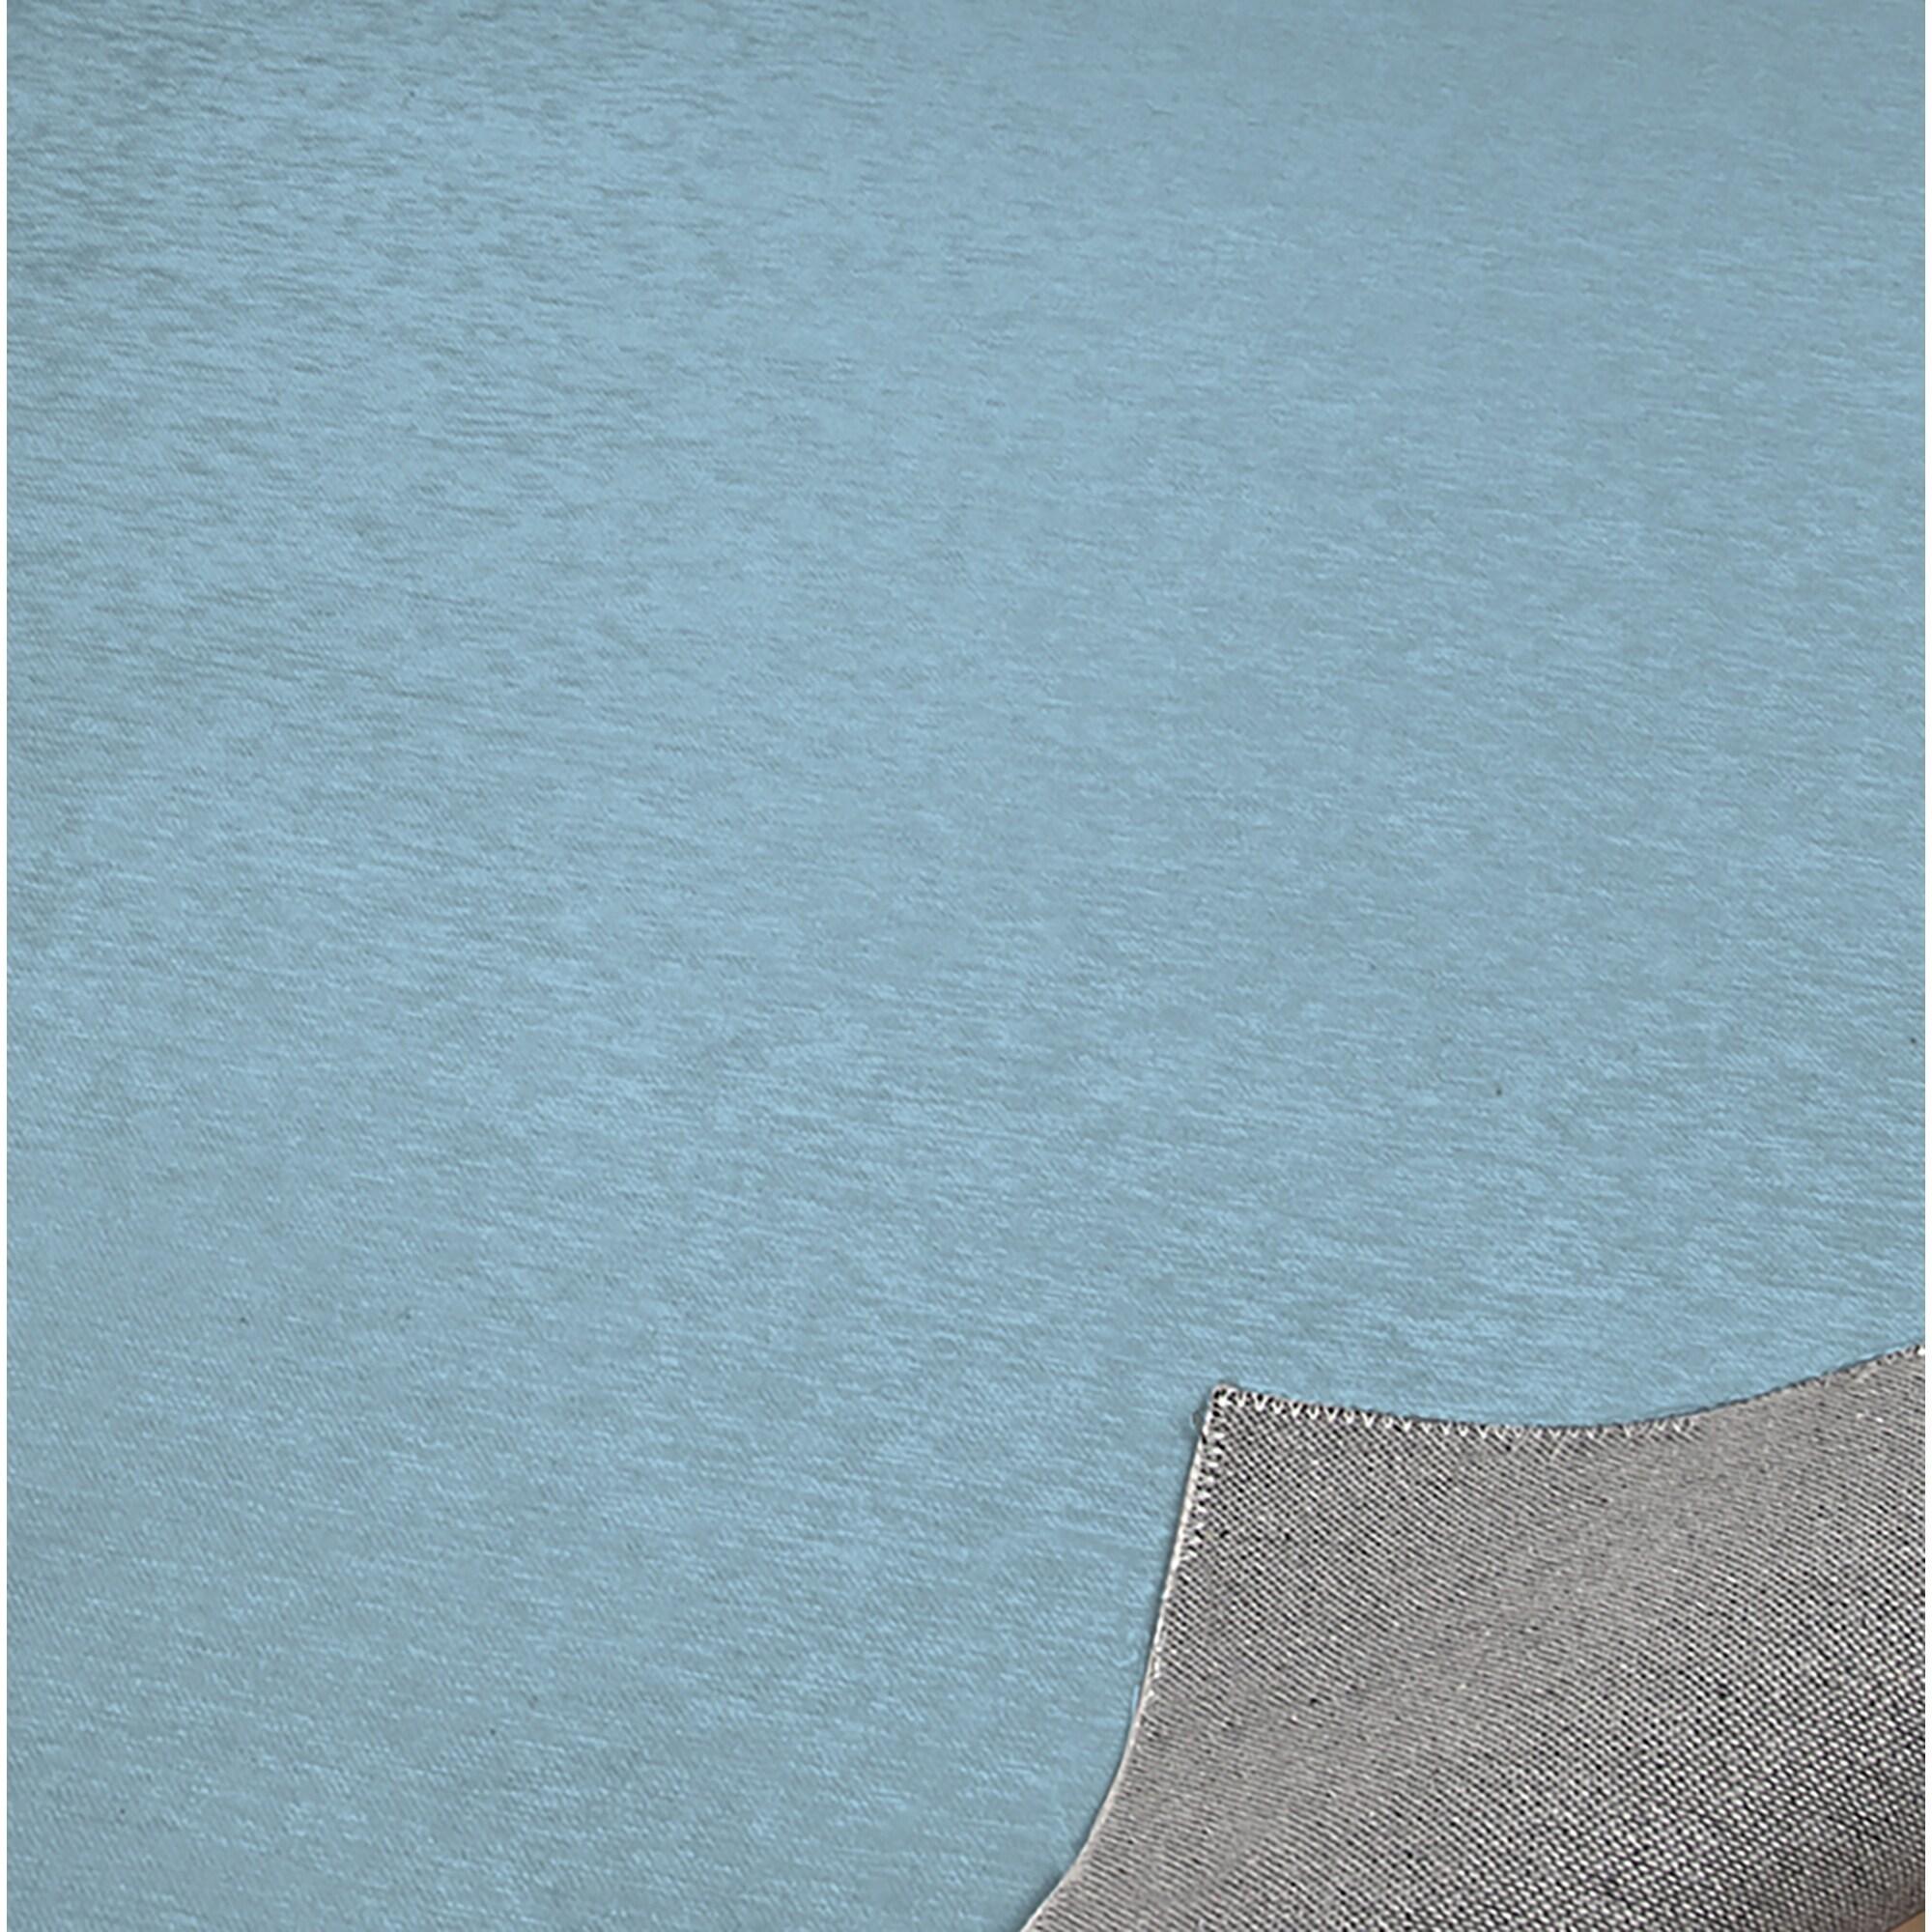 Nautical Horizon Boys Blue Kitchen Mat By Greg Conte Overstock 32029188